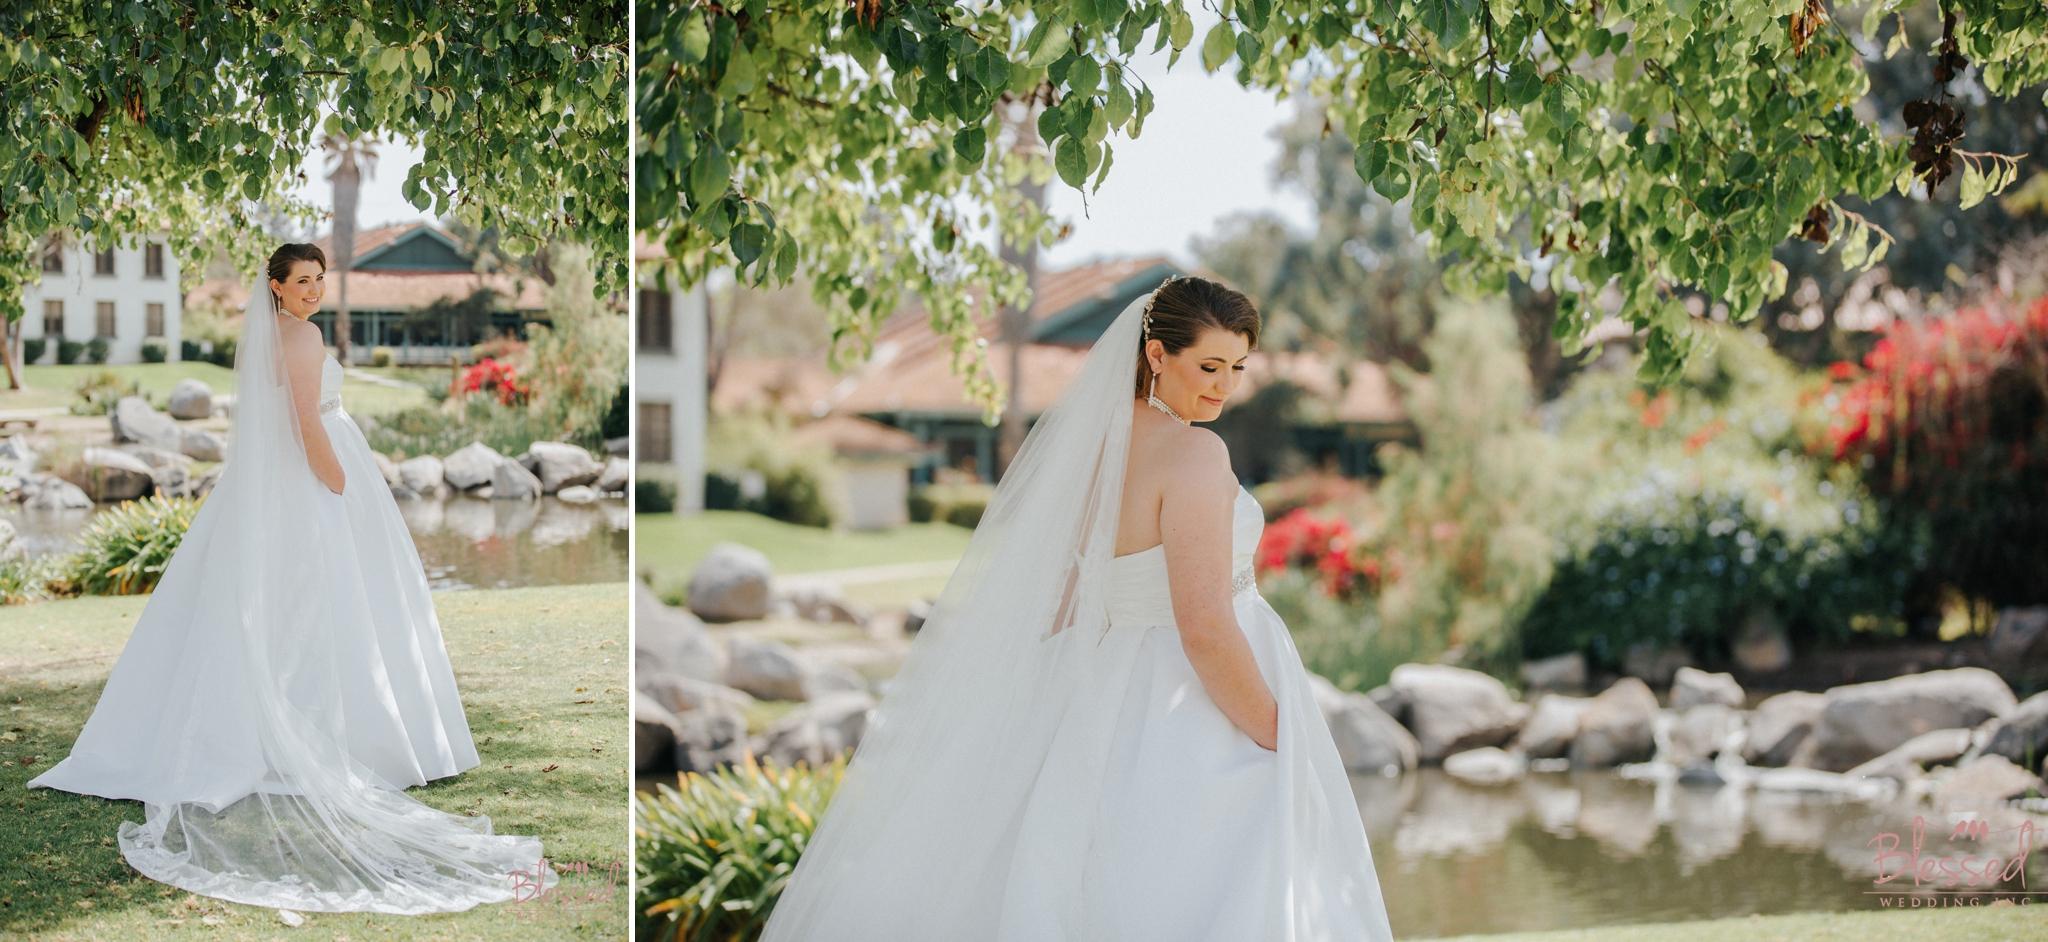 Orfila Vinery Wedding by Blessed Wedding Photography 23.jpg